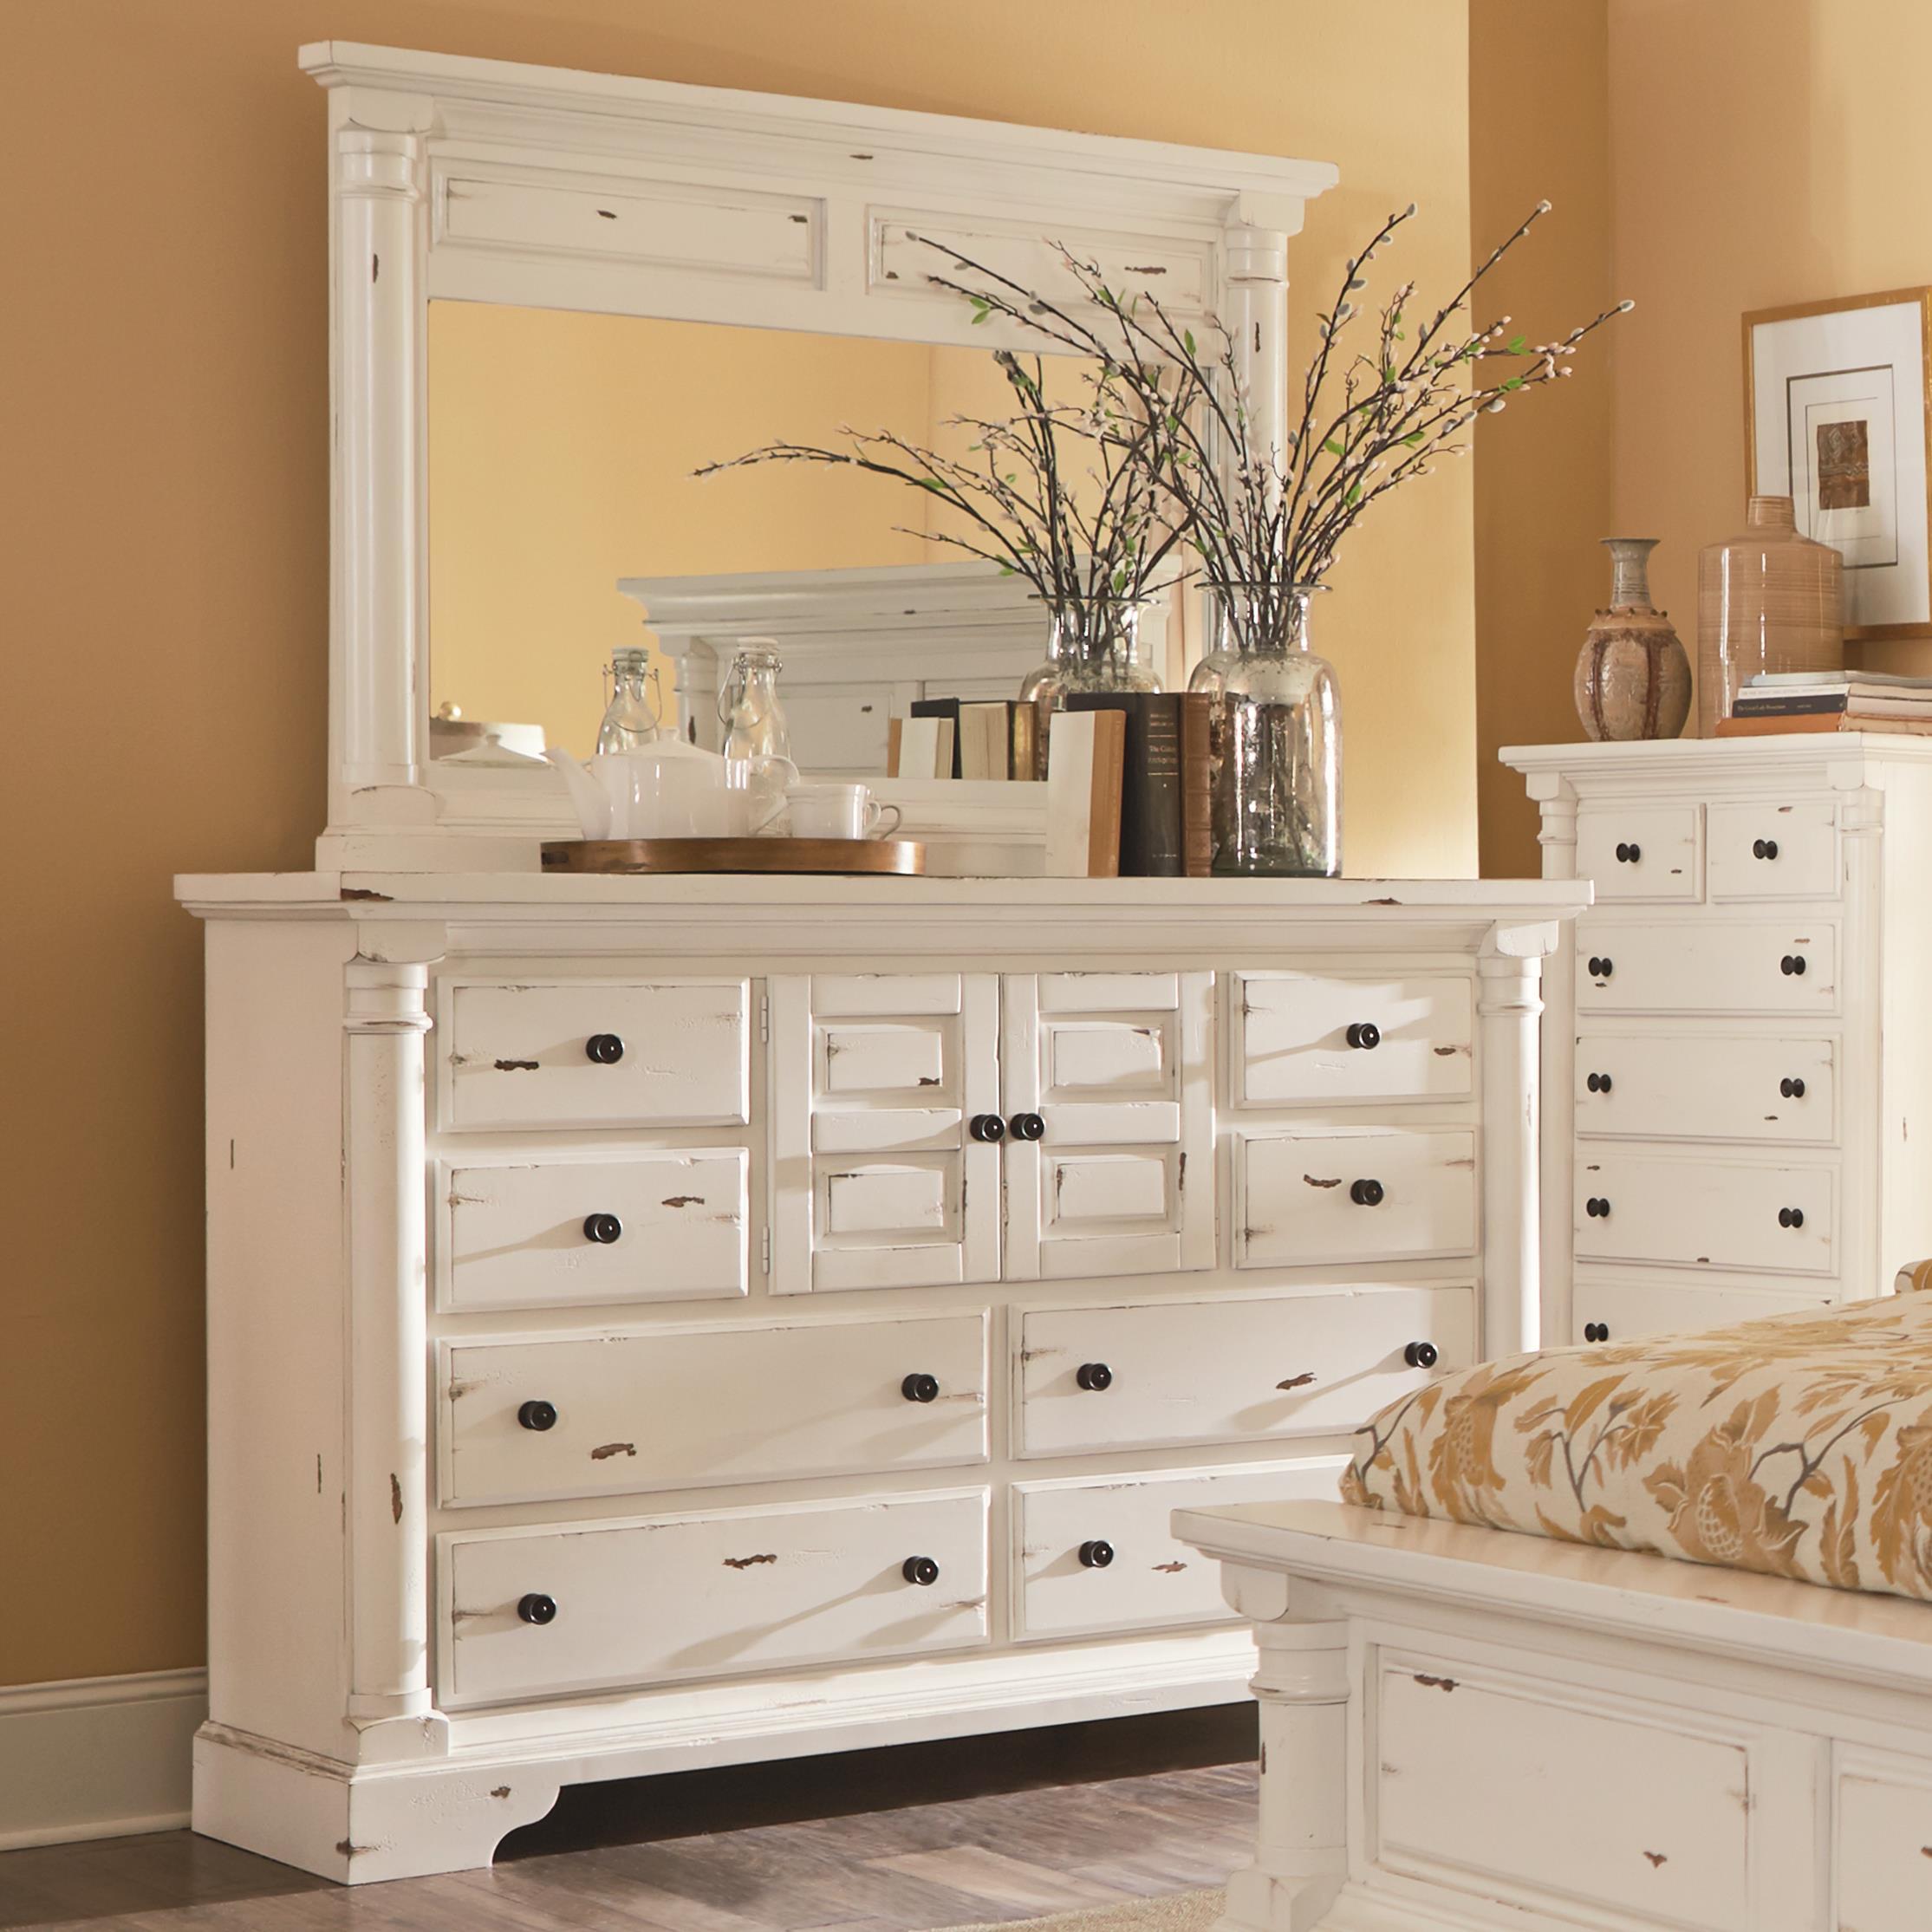 Progressive Furniture Gramercy Park Dresser and Mirror - Item Number: P661-50+24